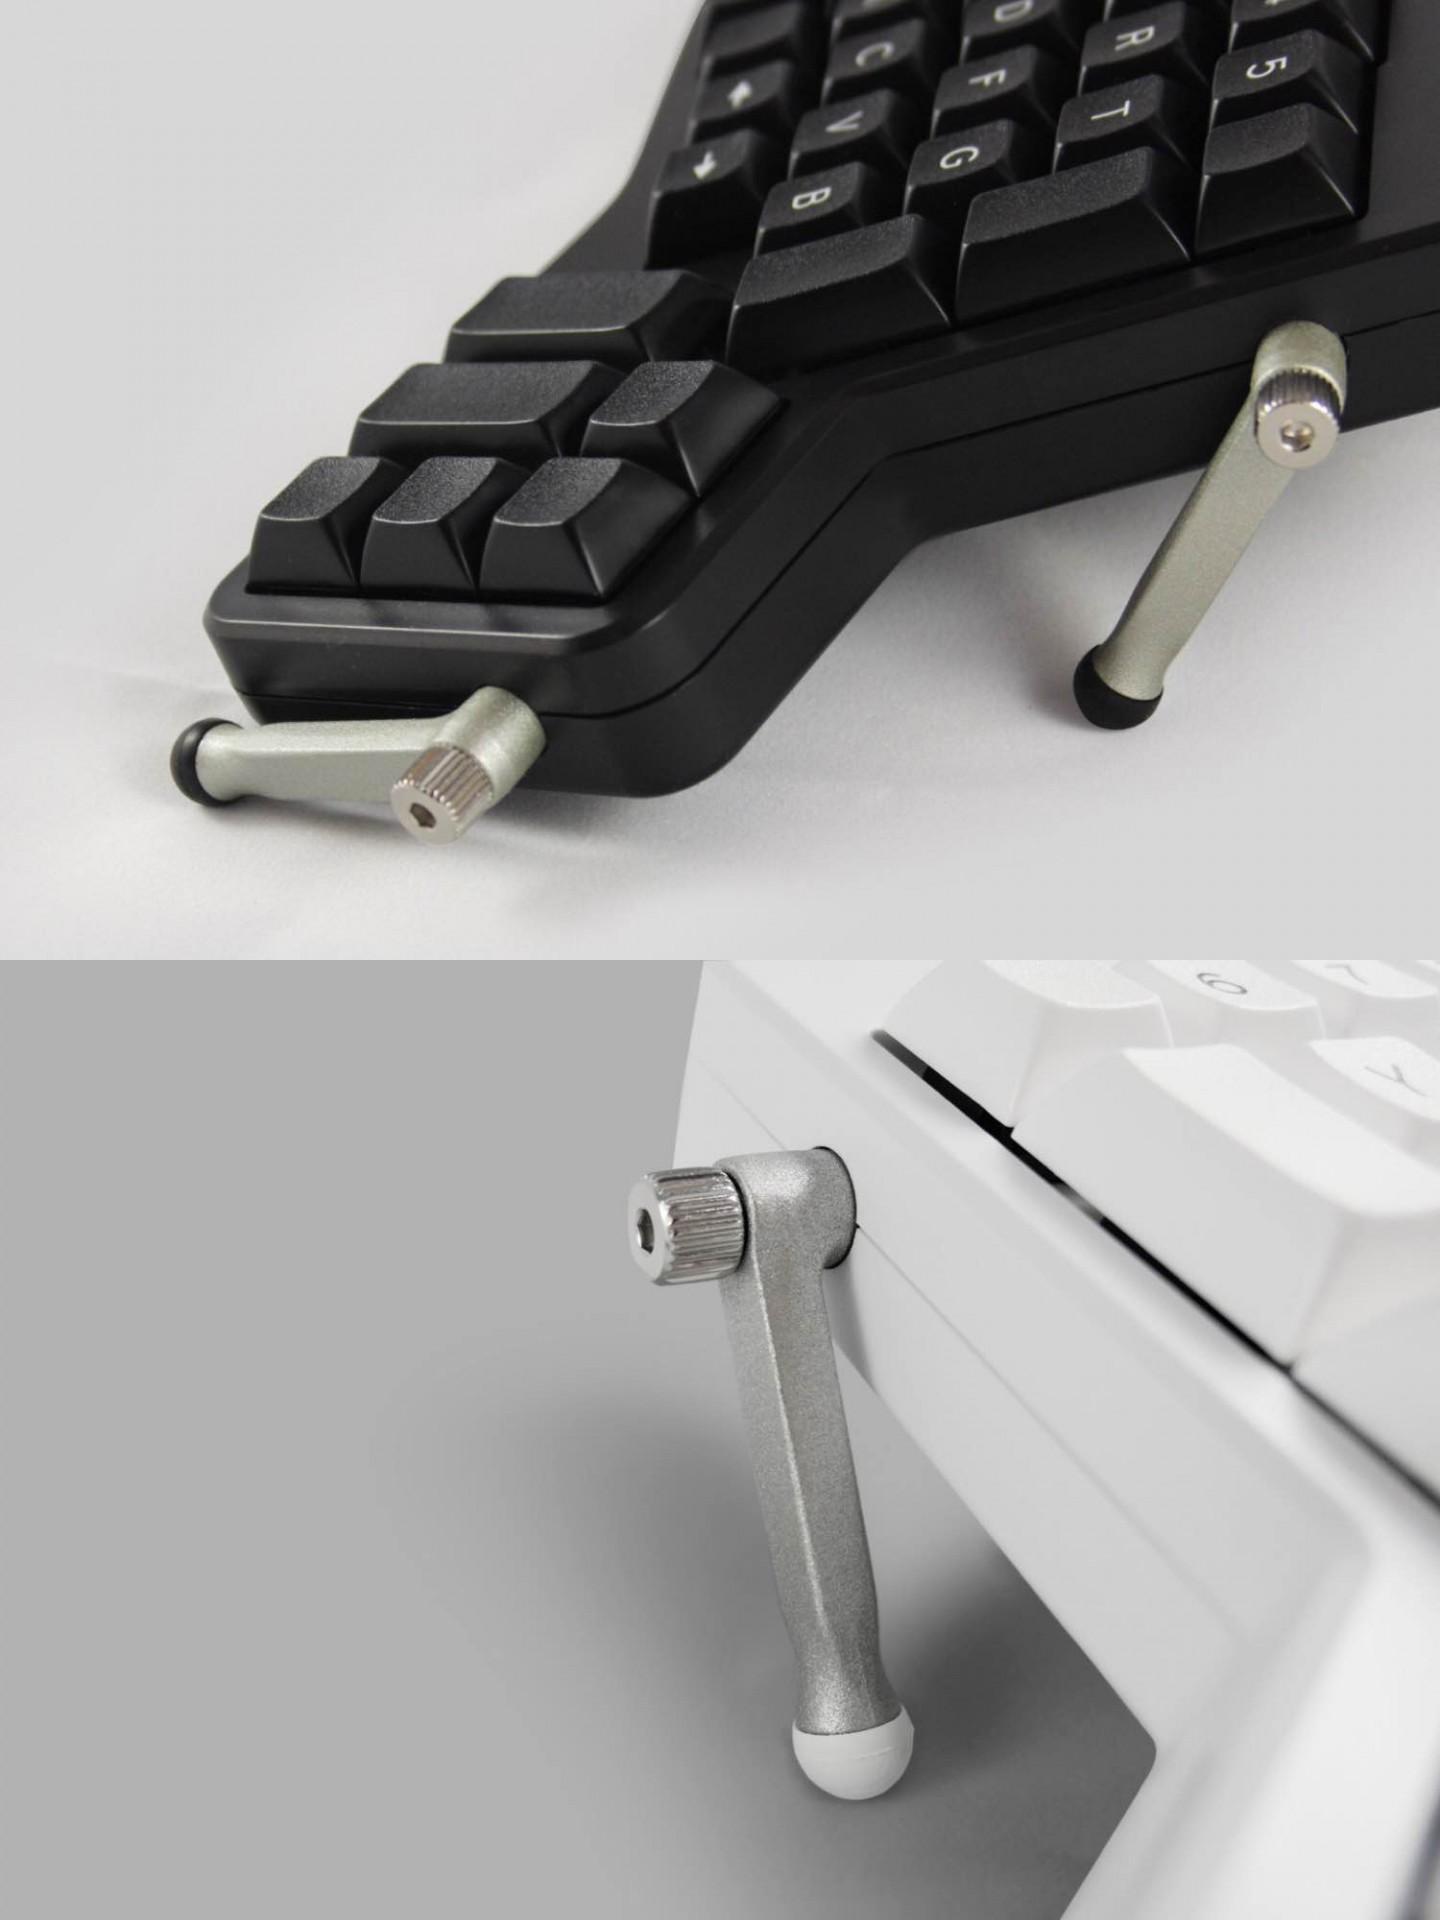 ergodox-ez-split-mechanical-keyboard-tilt-tent-legs